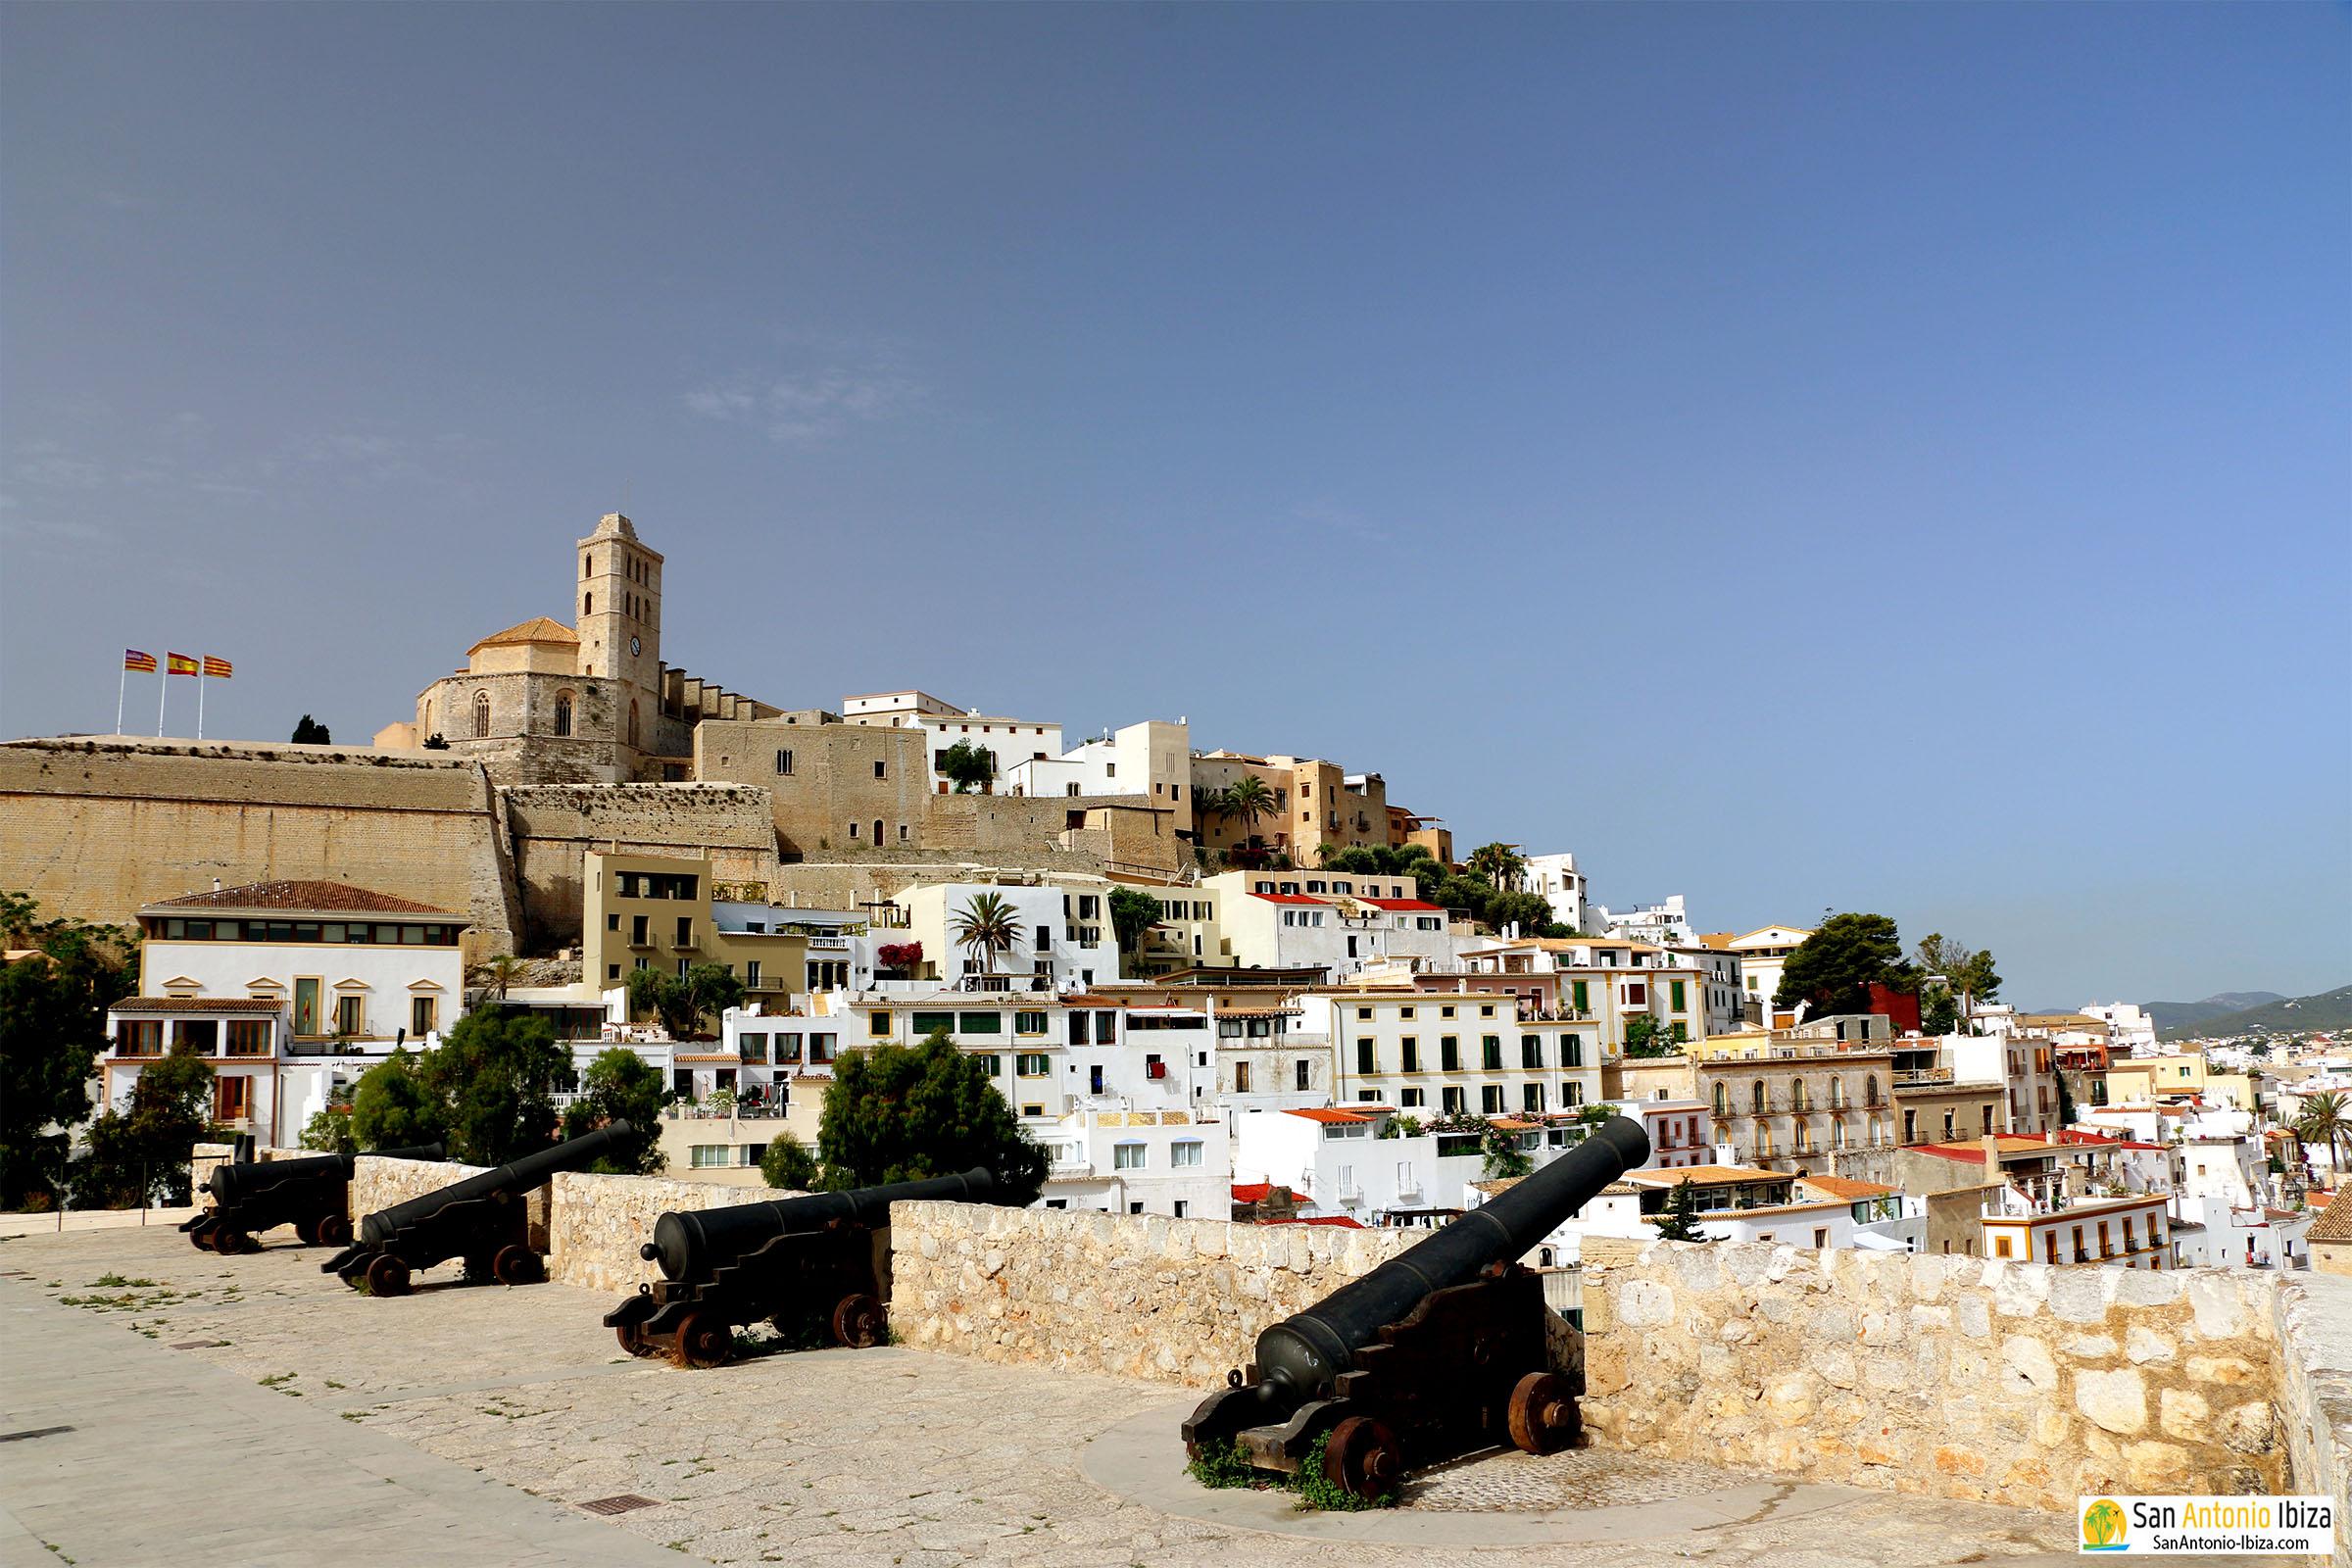 Ibiza Old Town Eivissa Dalt Vila - Cannons at Baluard de Santa Llucia